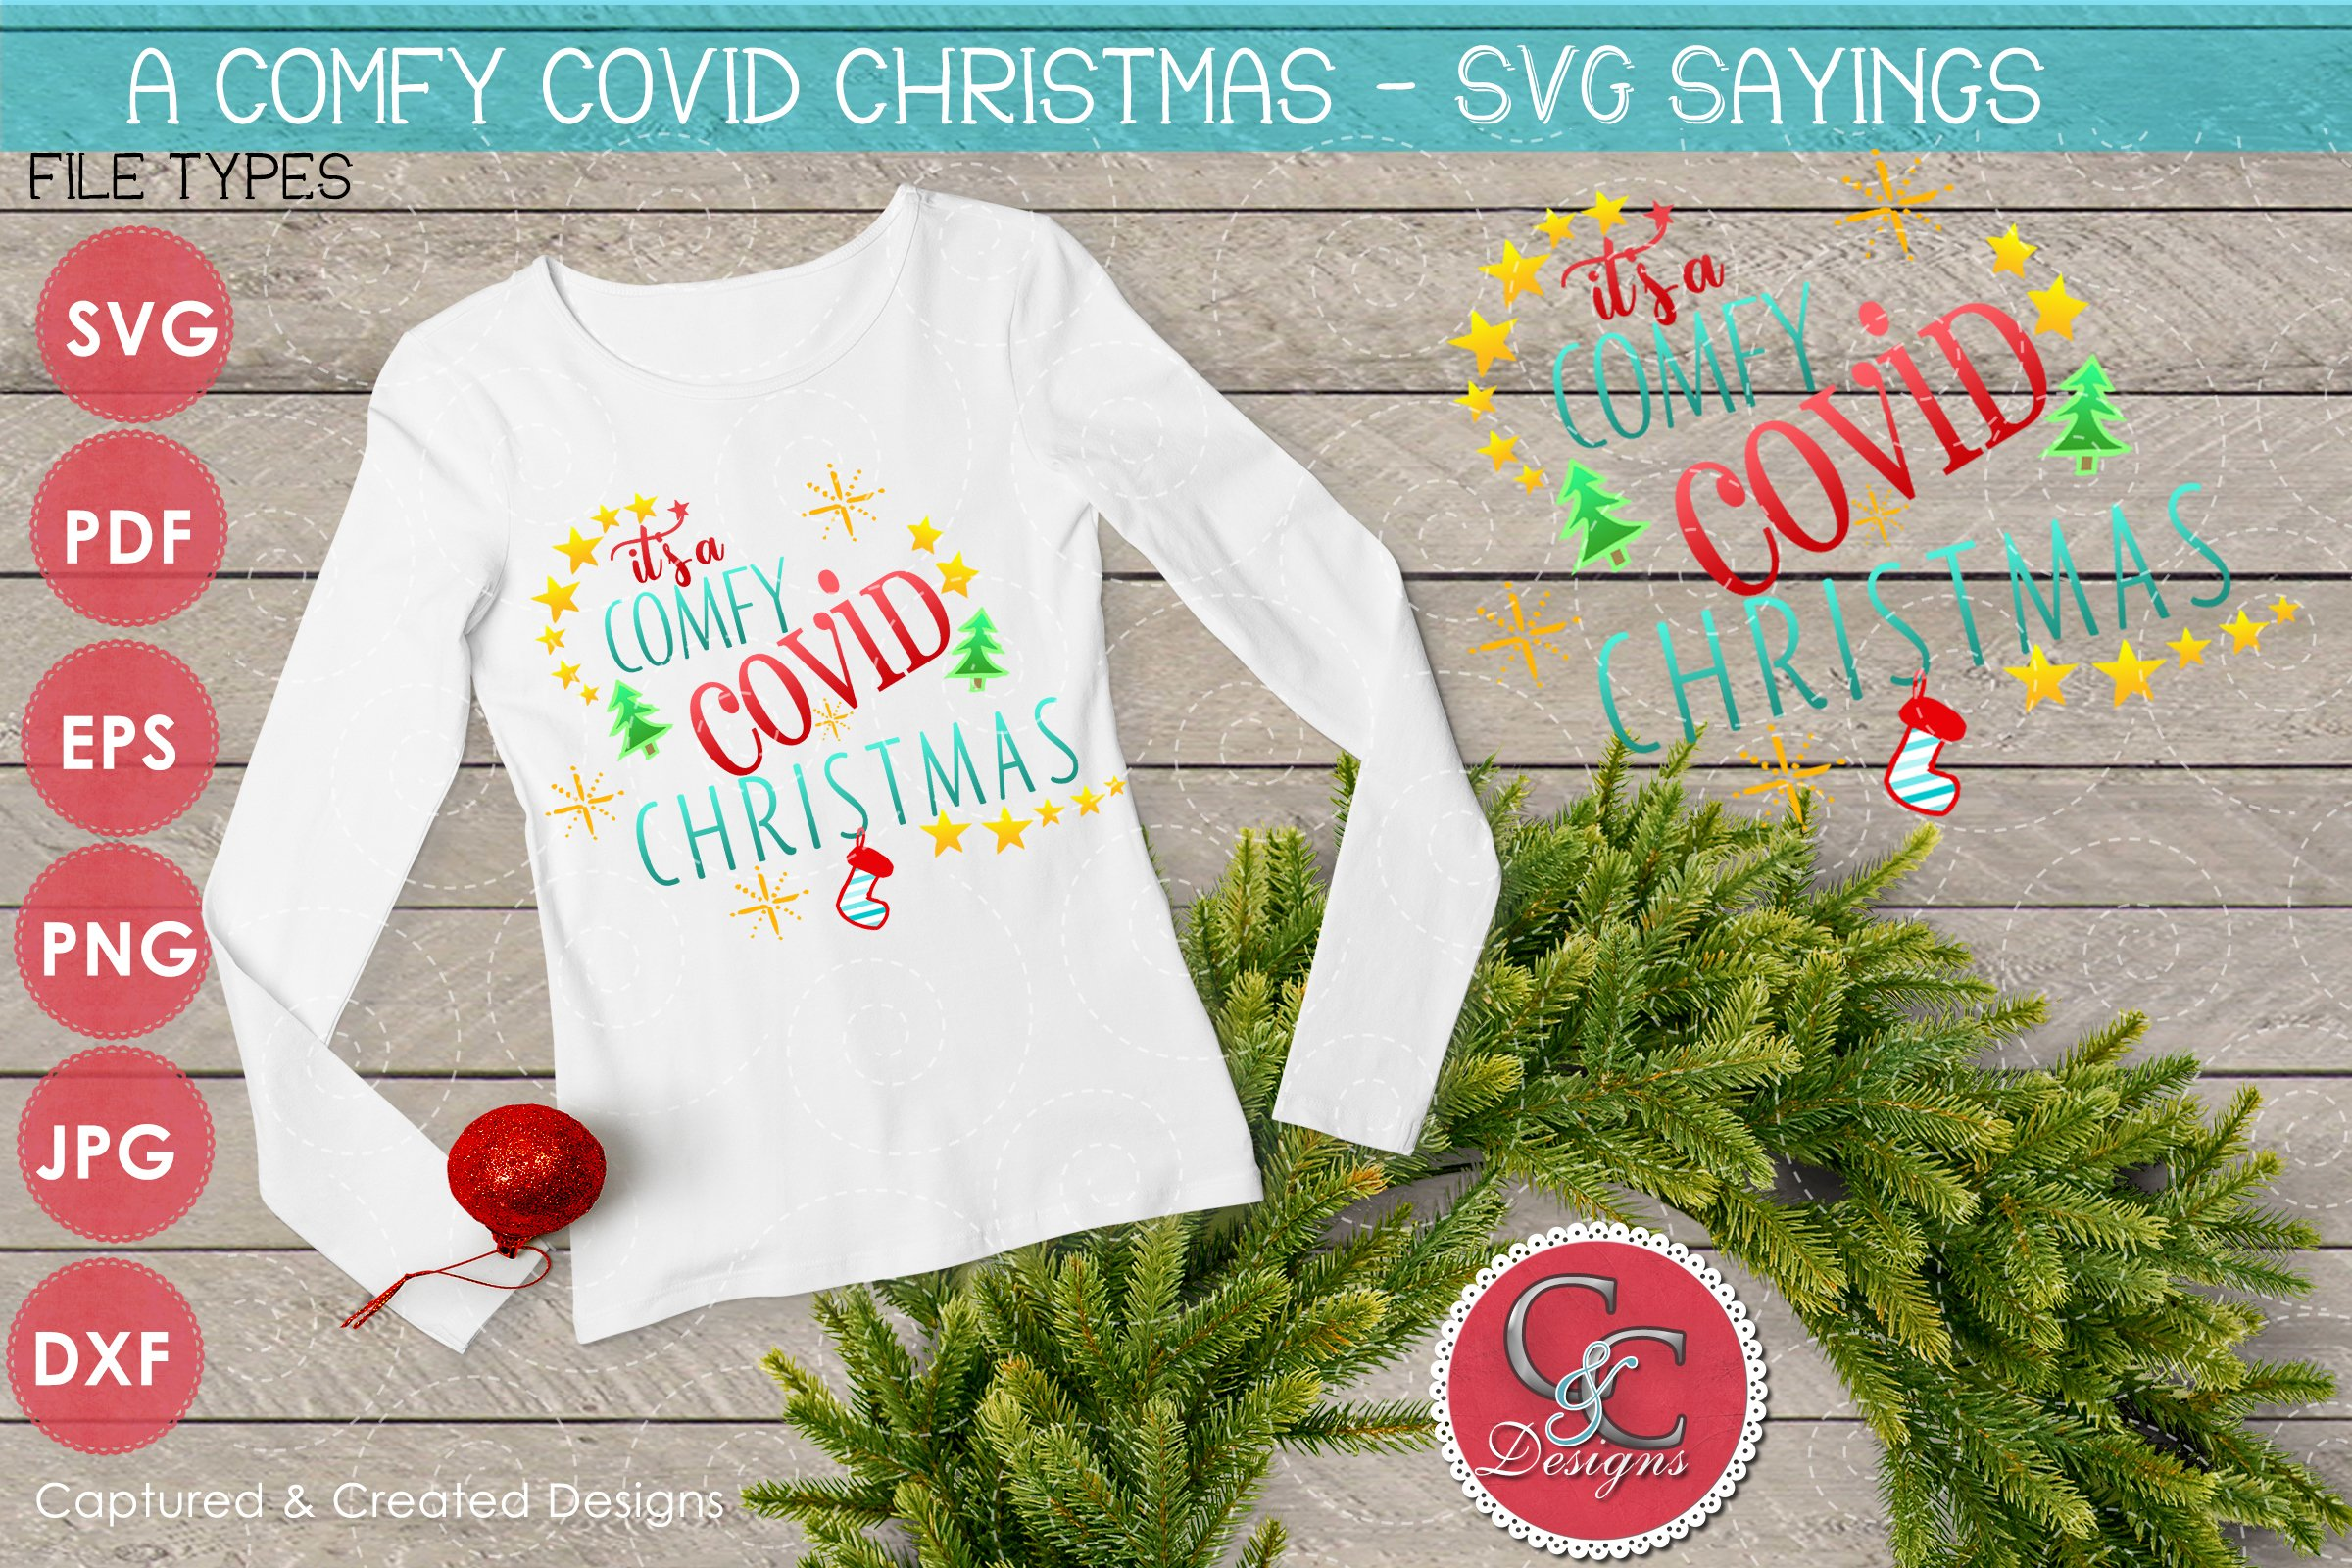 Free quarantine queen svg, covid 19, corona. Svg Christmas Sayings It S A Comfy Covid Christmas 847683 Cut Files Design Bundles